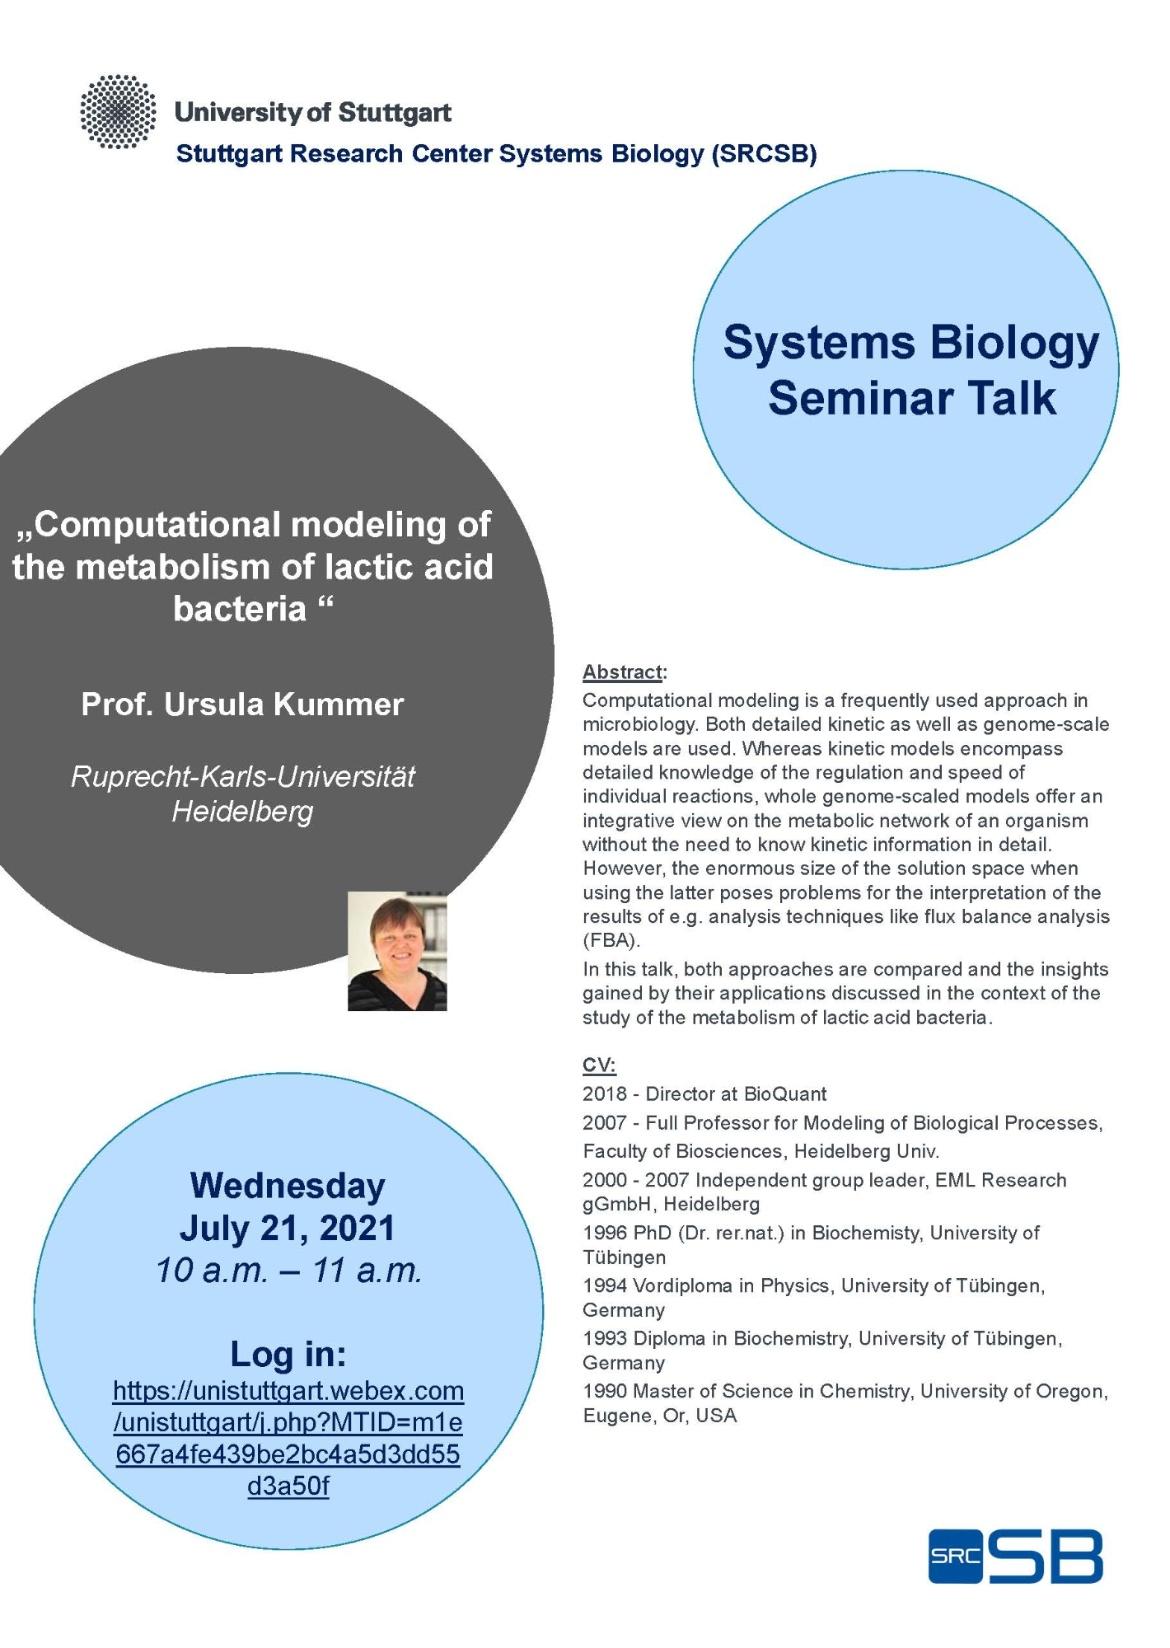 Announcement of the Talk of Prof. Ursula Kummer